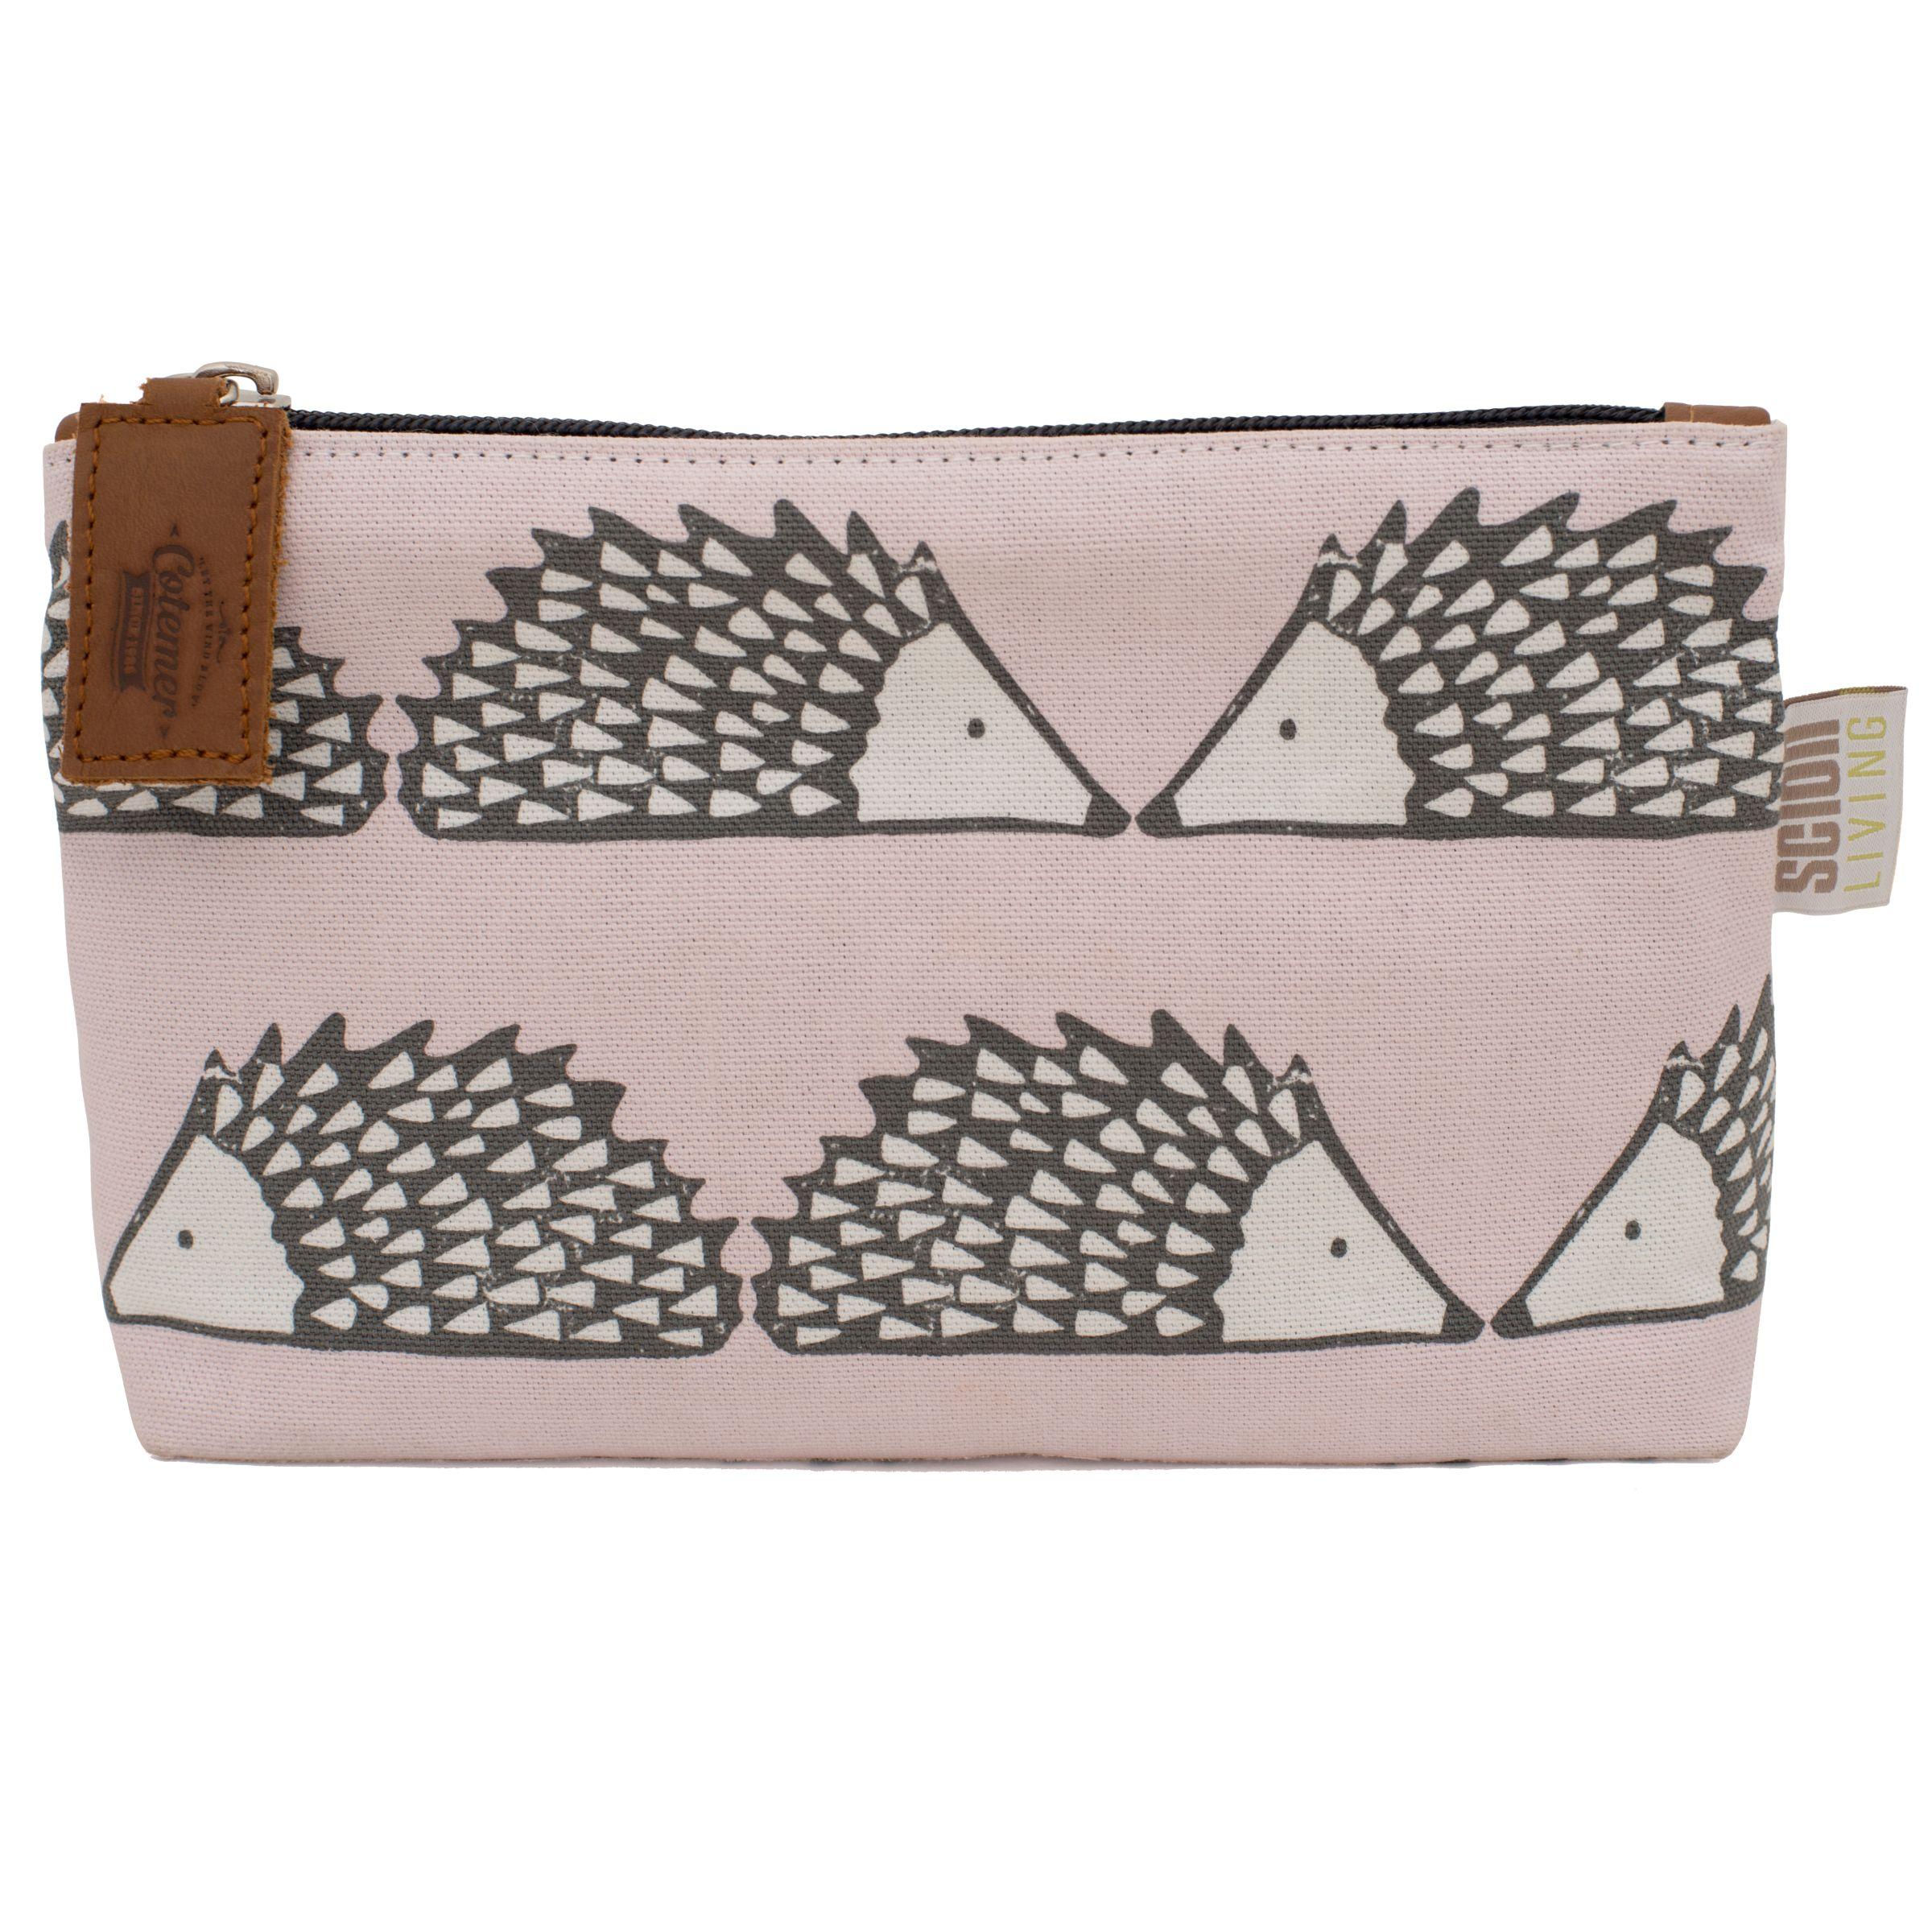 Scion Scion Spike Small Wash Bag